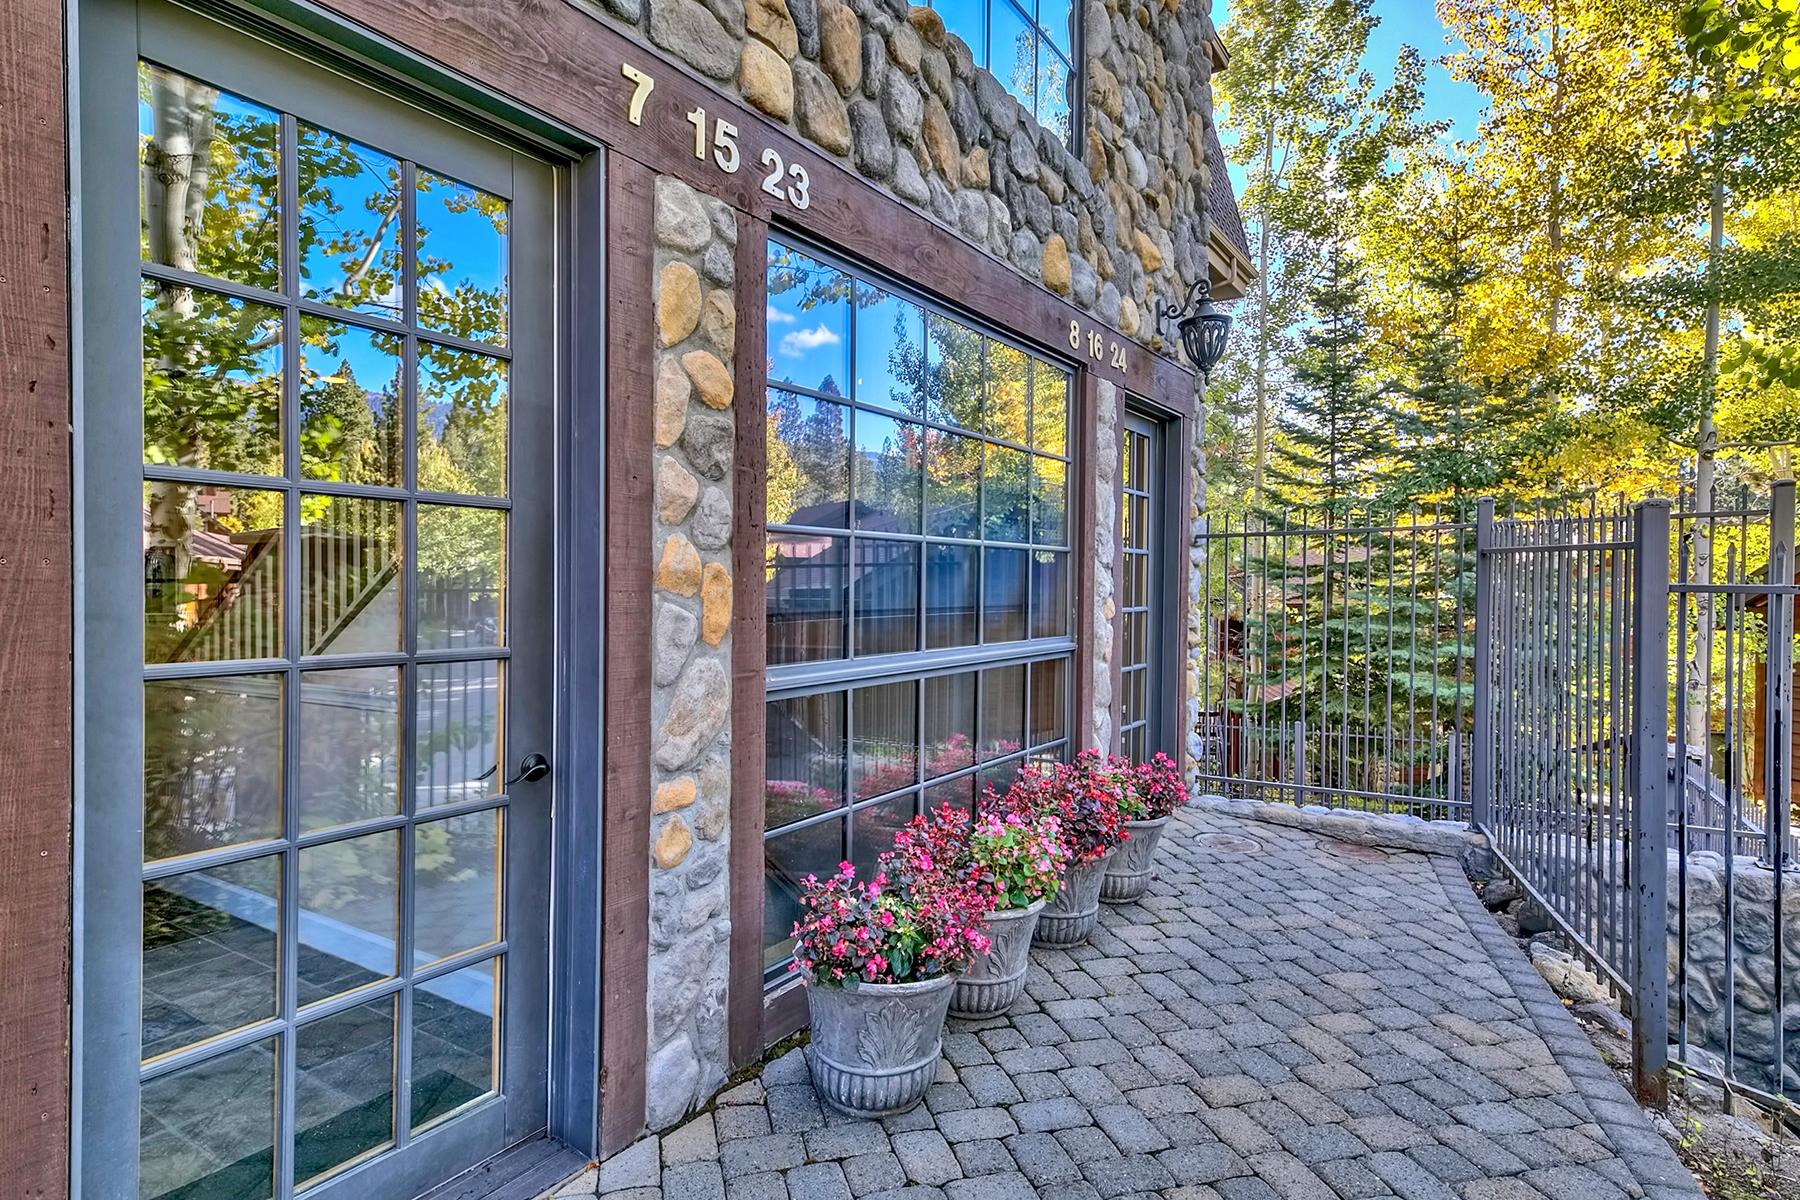 Additional photo for property listing at 933 Northwood Blvd. #15, Incline Village, Nevada 933 Northwood Blvd. #15 Incline Village, Nevada 89451 United States